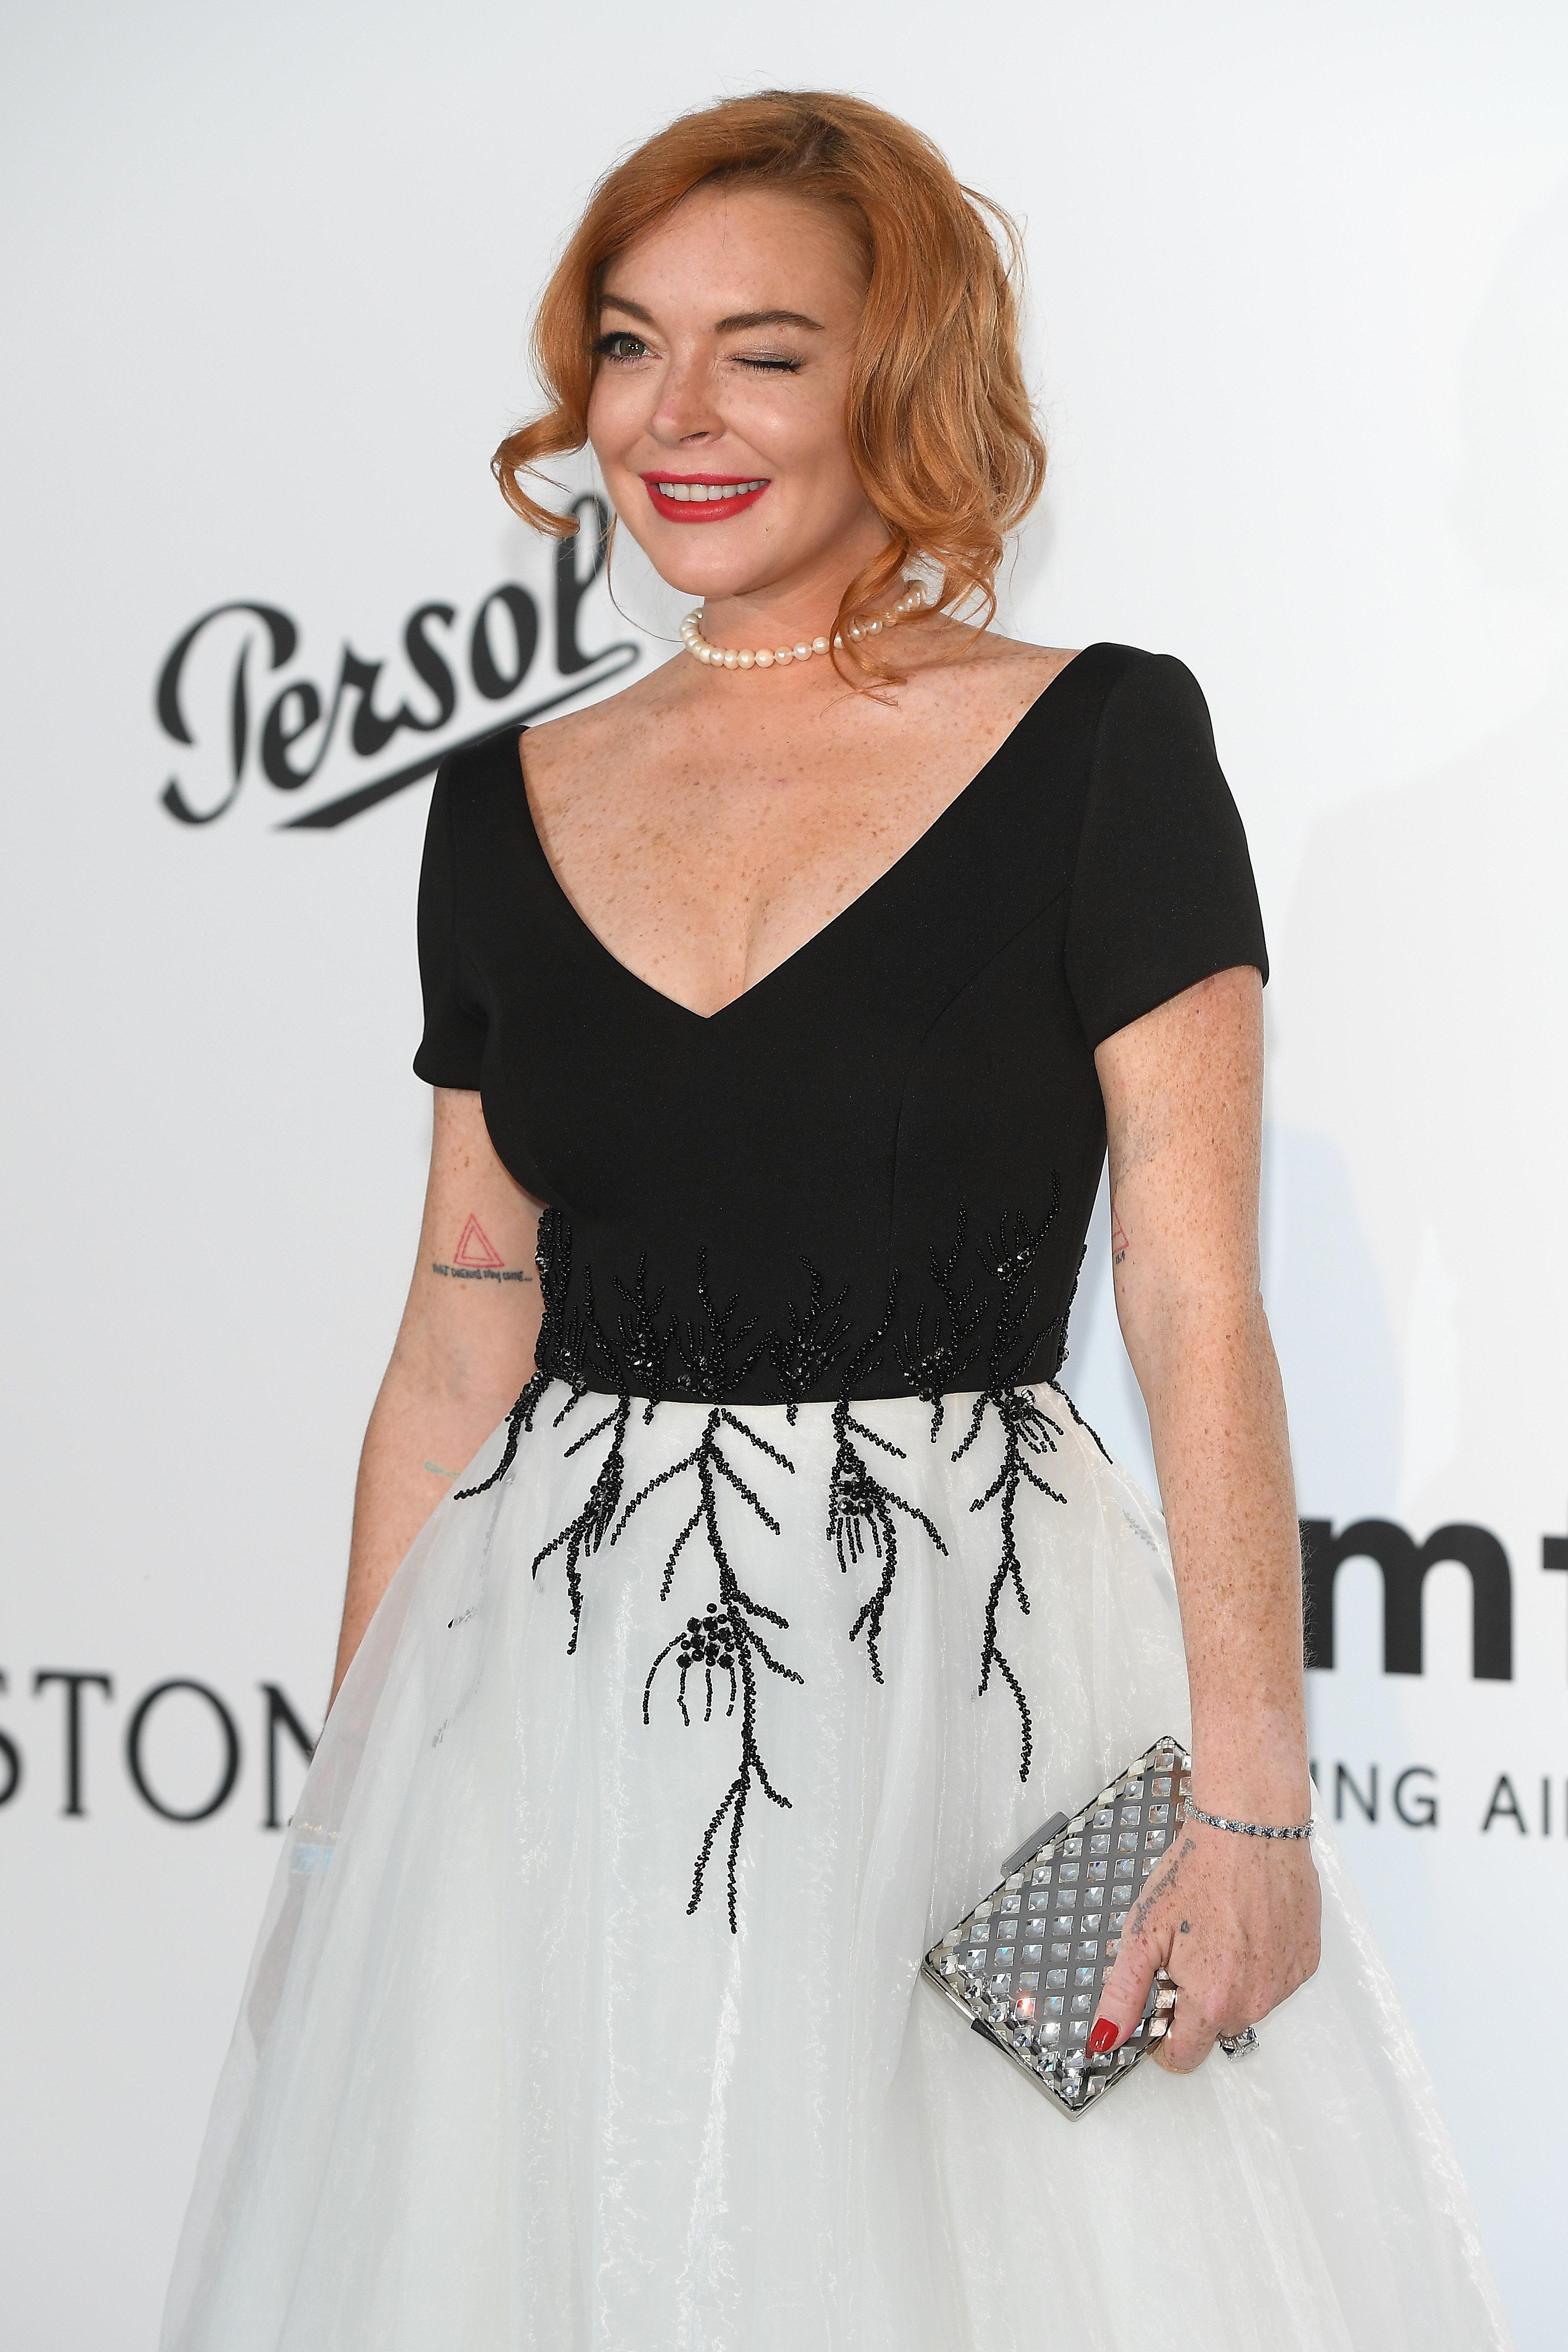 CAP D'ANTIBES, FRANCE - MAY 25:  Lindsay Lohan arrives at the amfAR Gala Cannes 2017 at Hotel du Cap-Eden-Roc on May 25, 2017 in Cap d'Antibes, France.  (Photo by Venturelli/WireImage for amfAR)